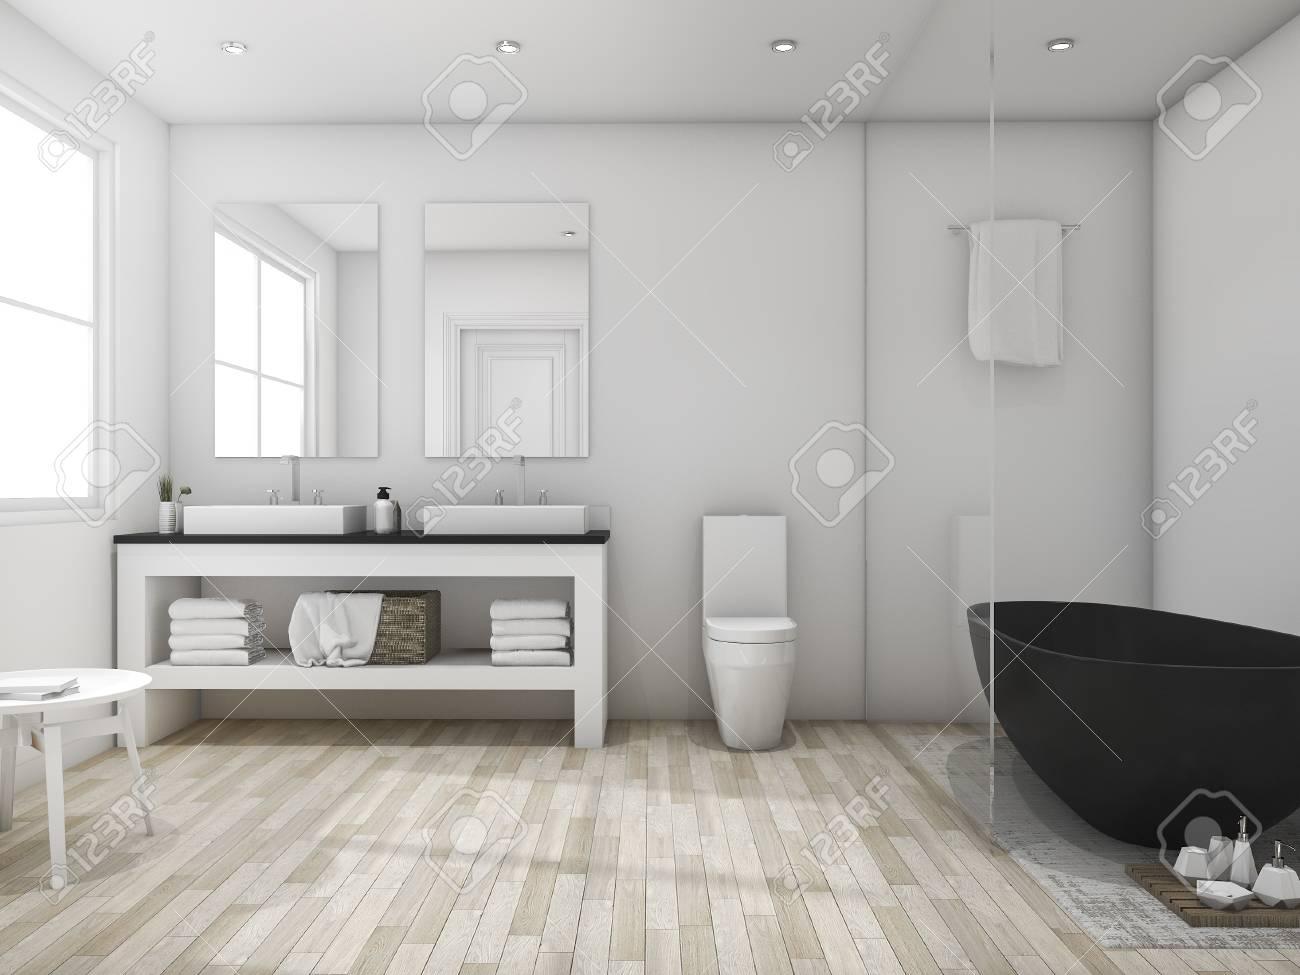 3d Rendering Minimal Loft Bathroom With Black Bathtub Stock Photo ...